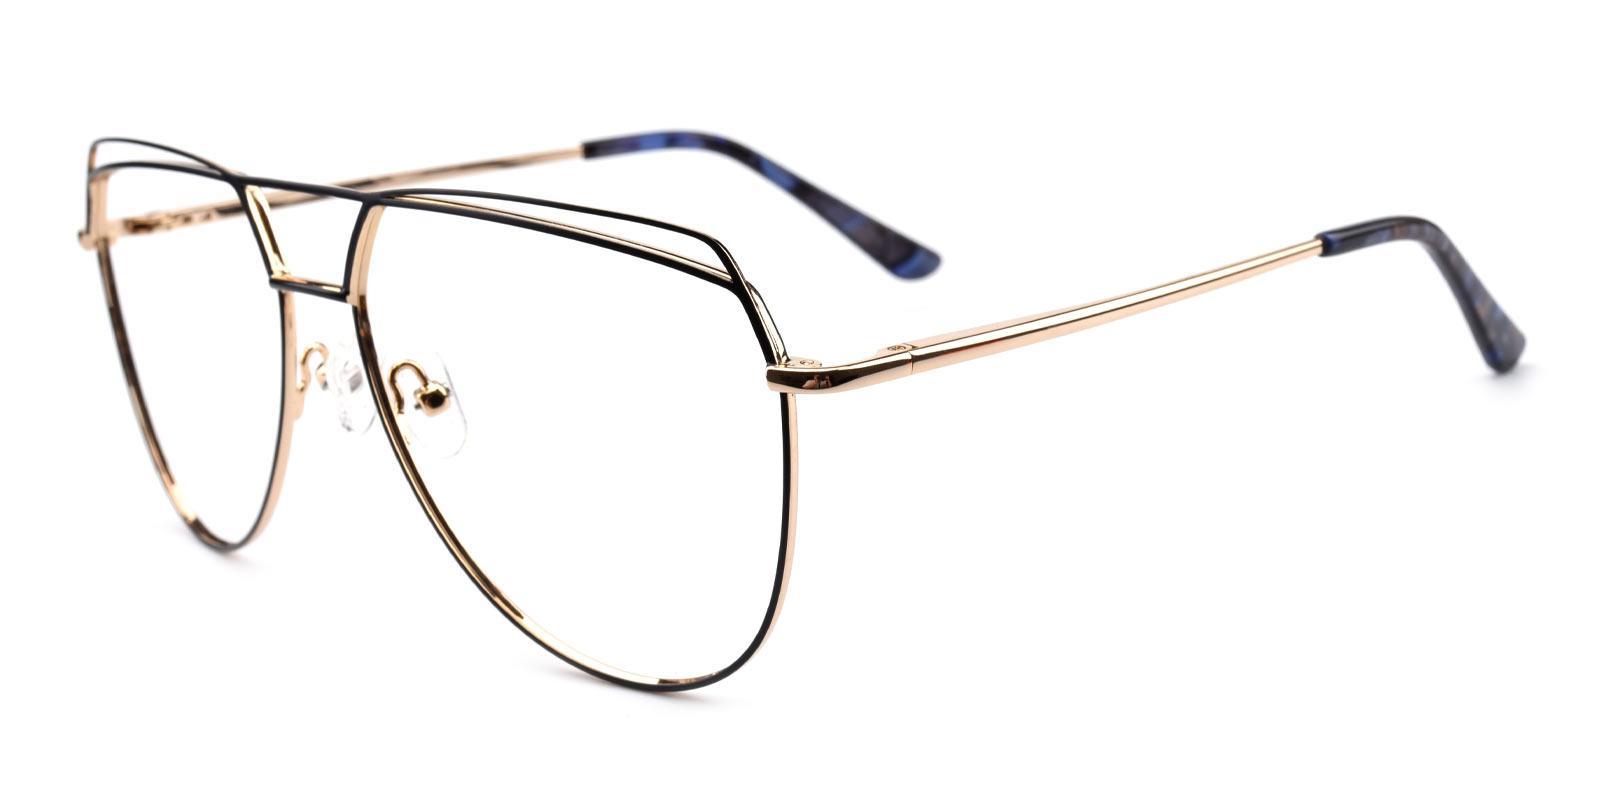 Nicole-Black-Aviator-Metal-Eyeglasses-additional1